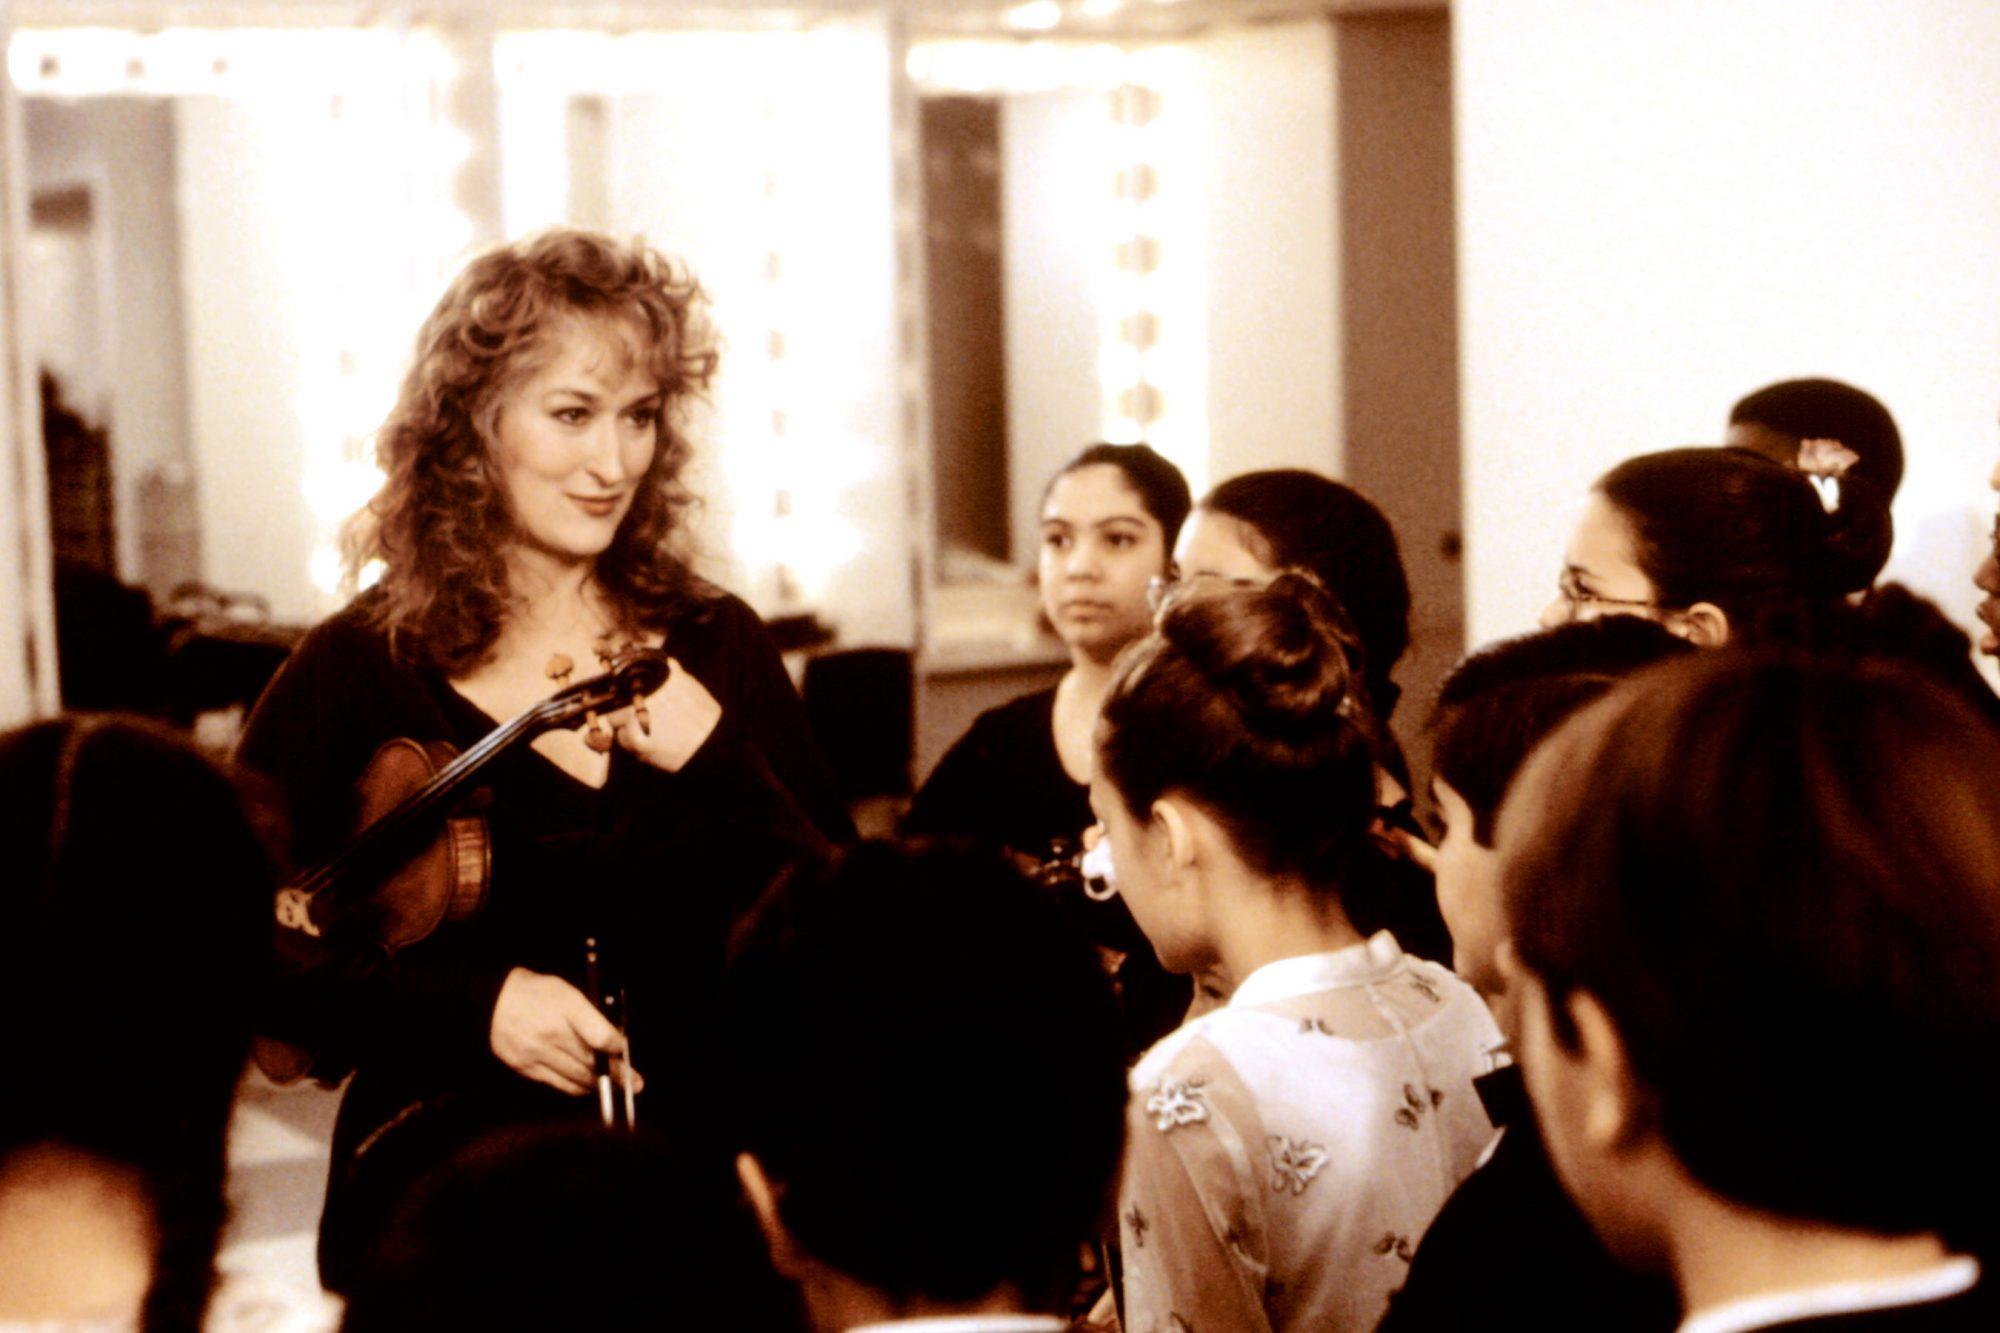 MUSIC OF THE HEART, Meryl Streep, 1999